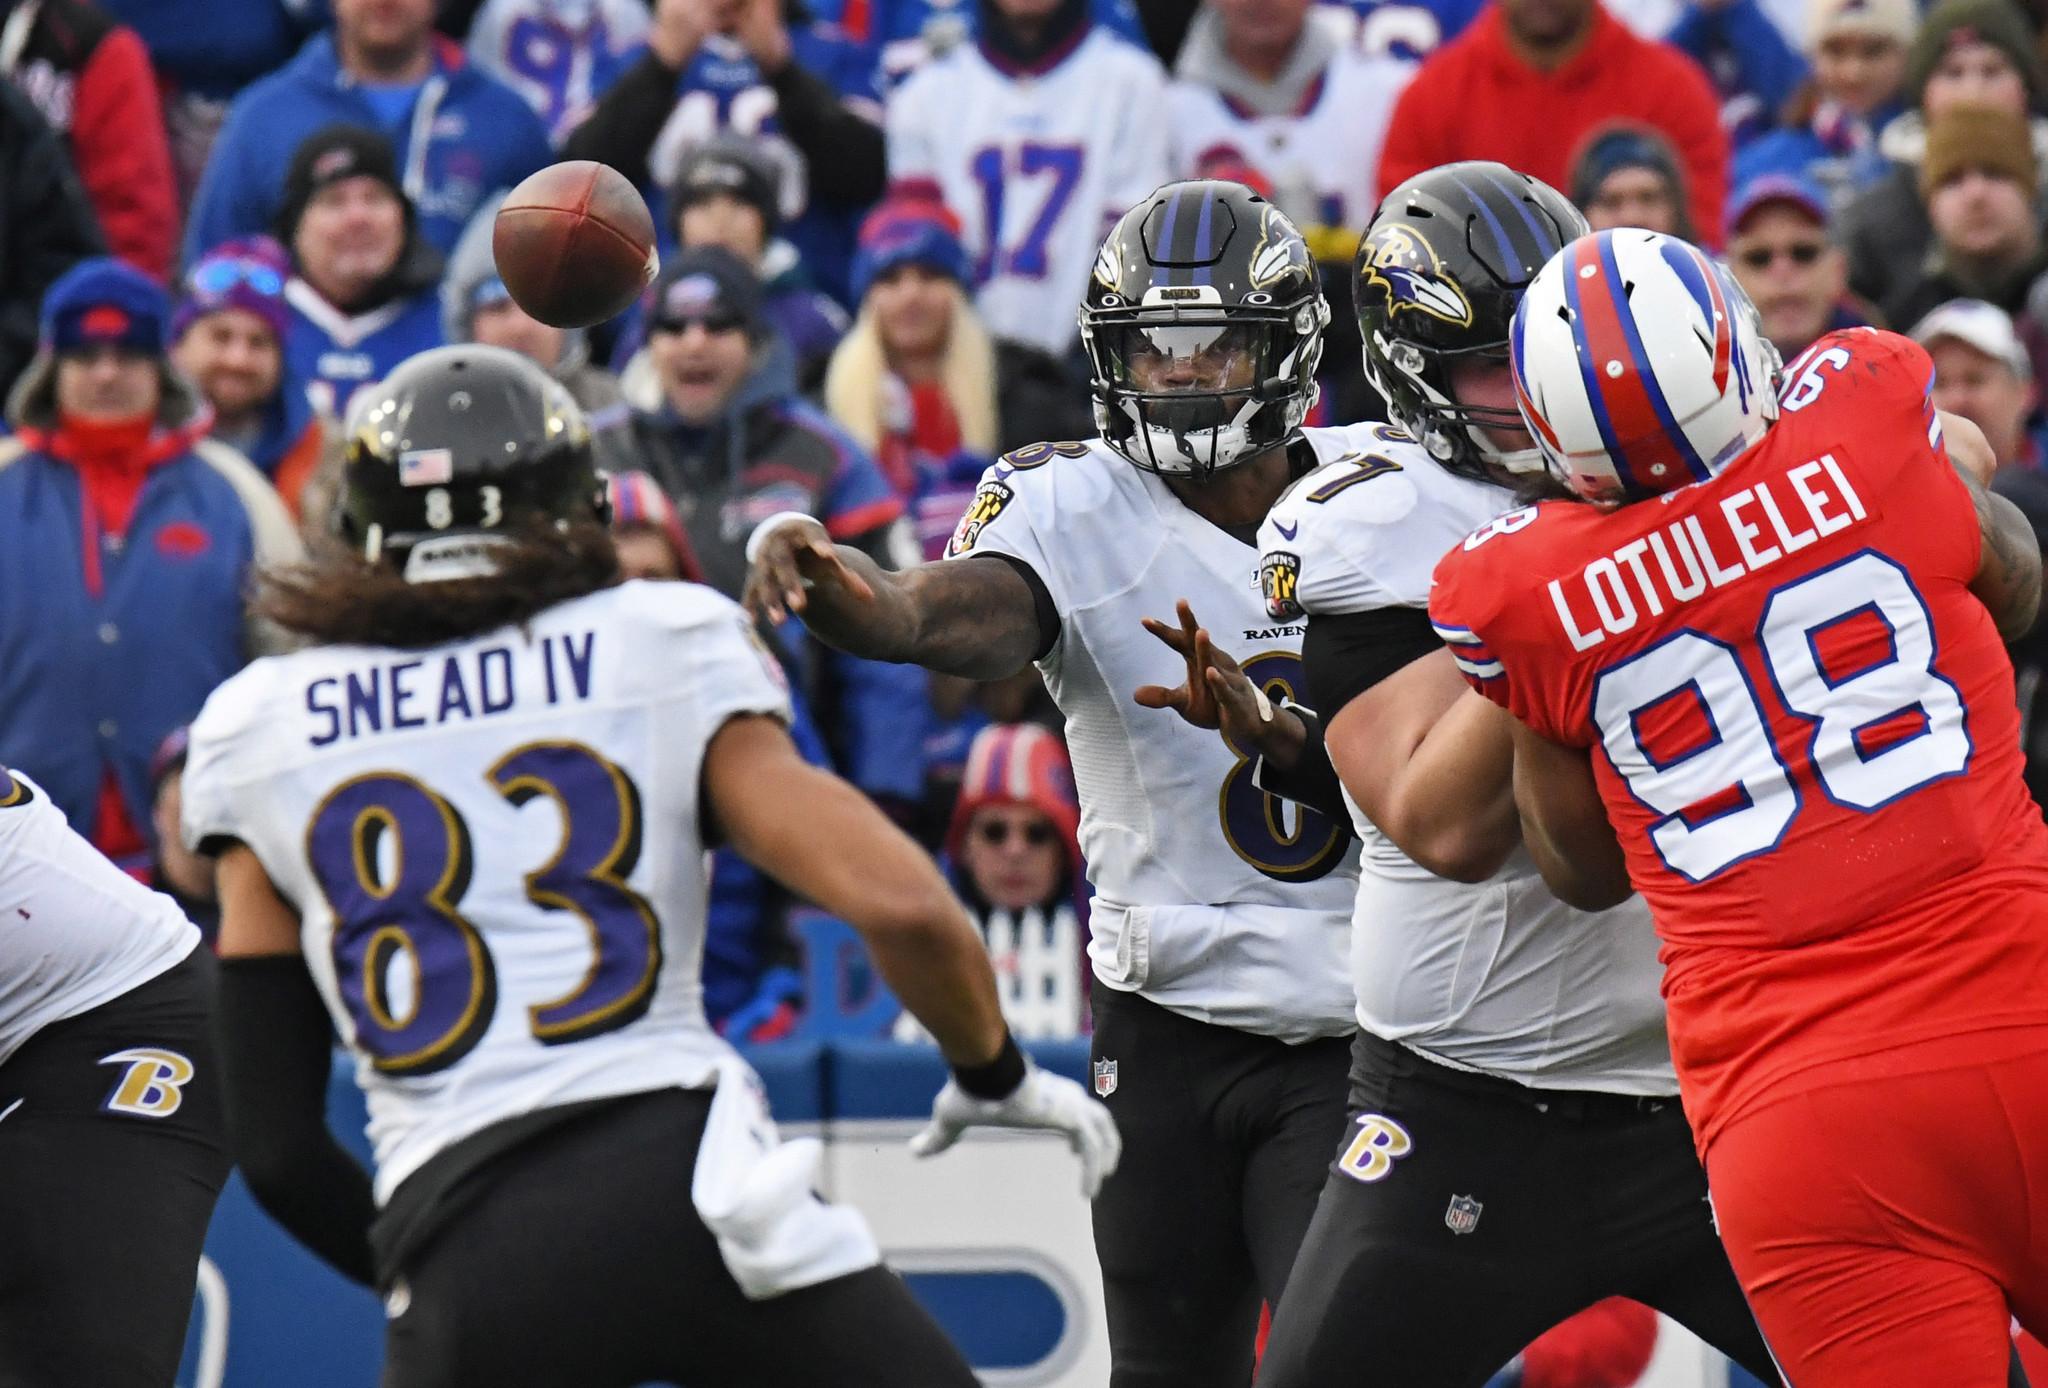 Ravens Vs Bills Dec 8 2019 Photos Capital Gazette